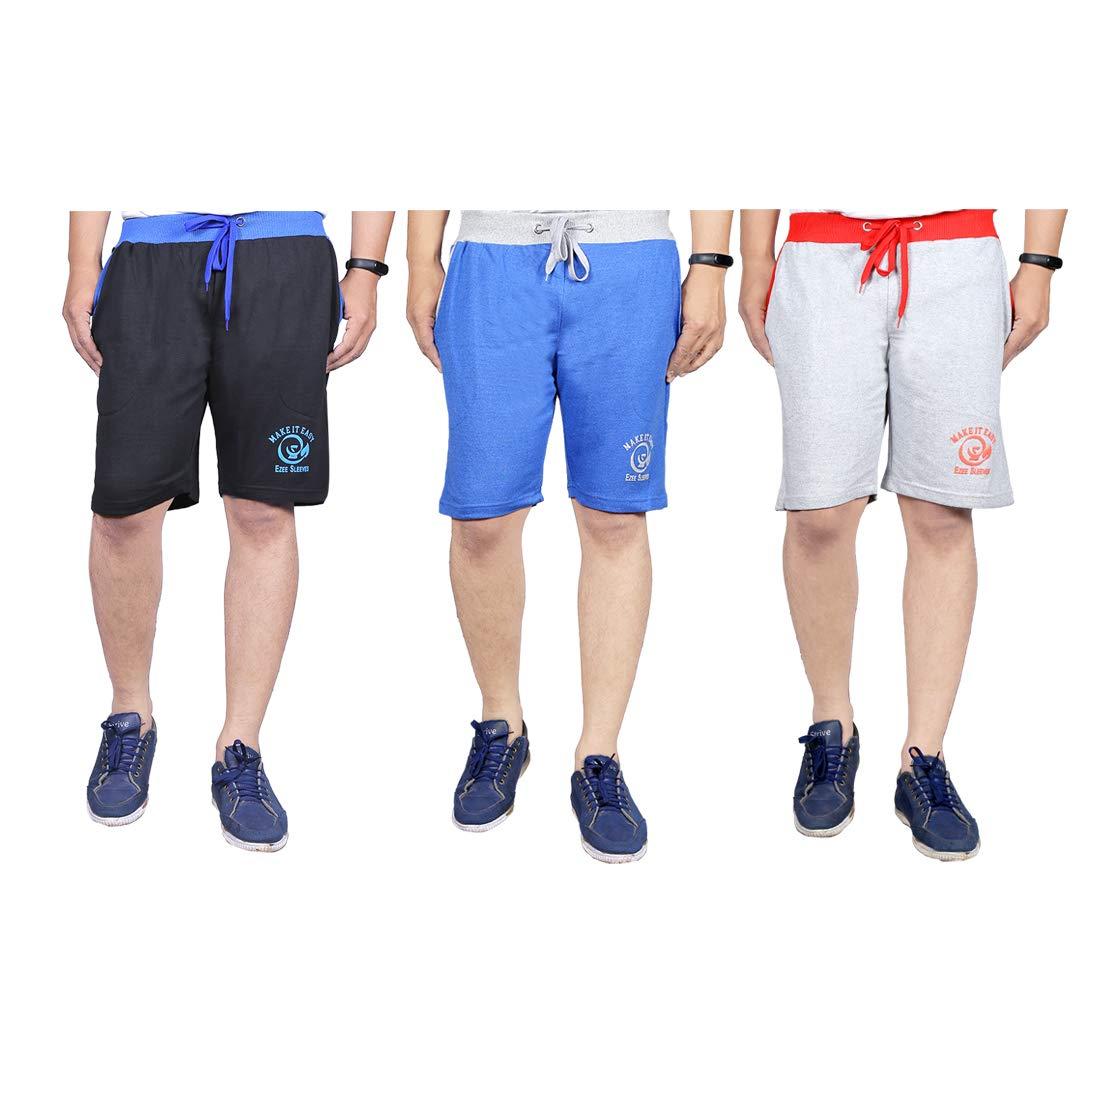 Ezee Sleeves Men's Cotton Shorts Combo (Set of 3)